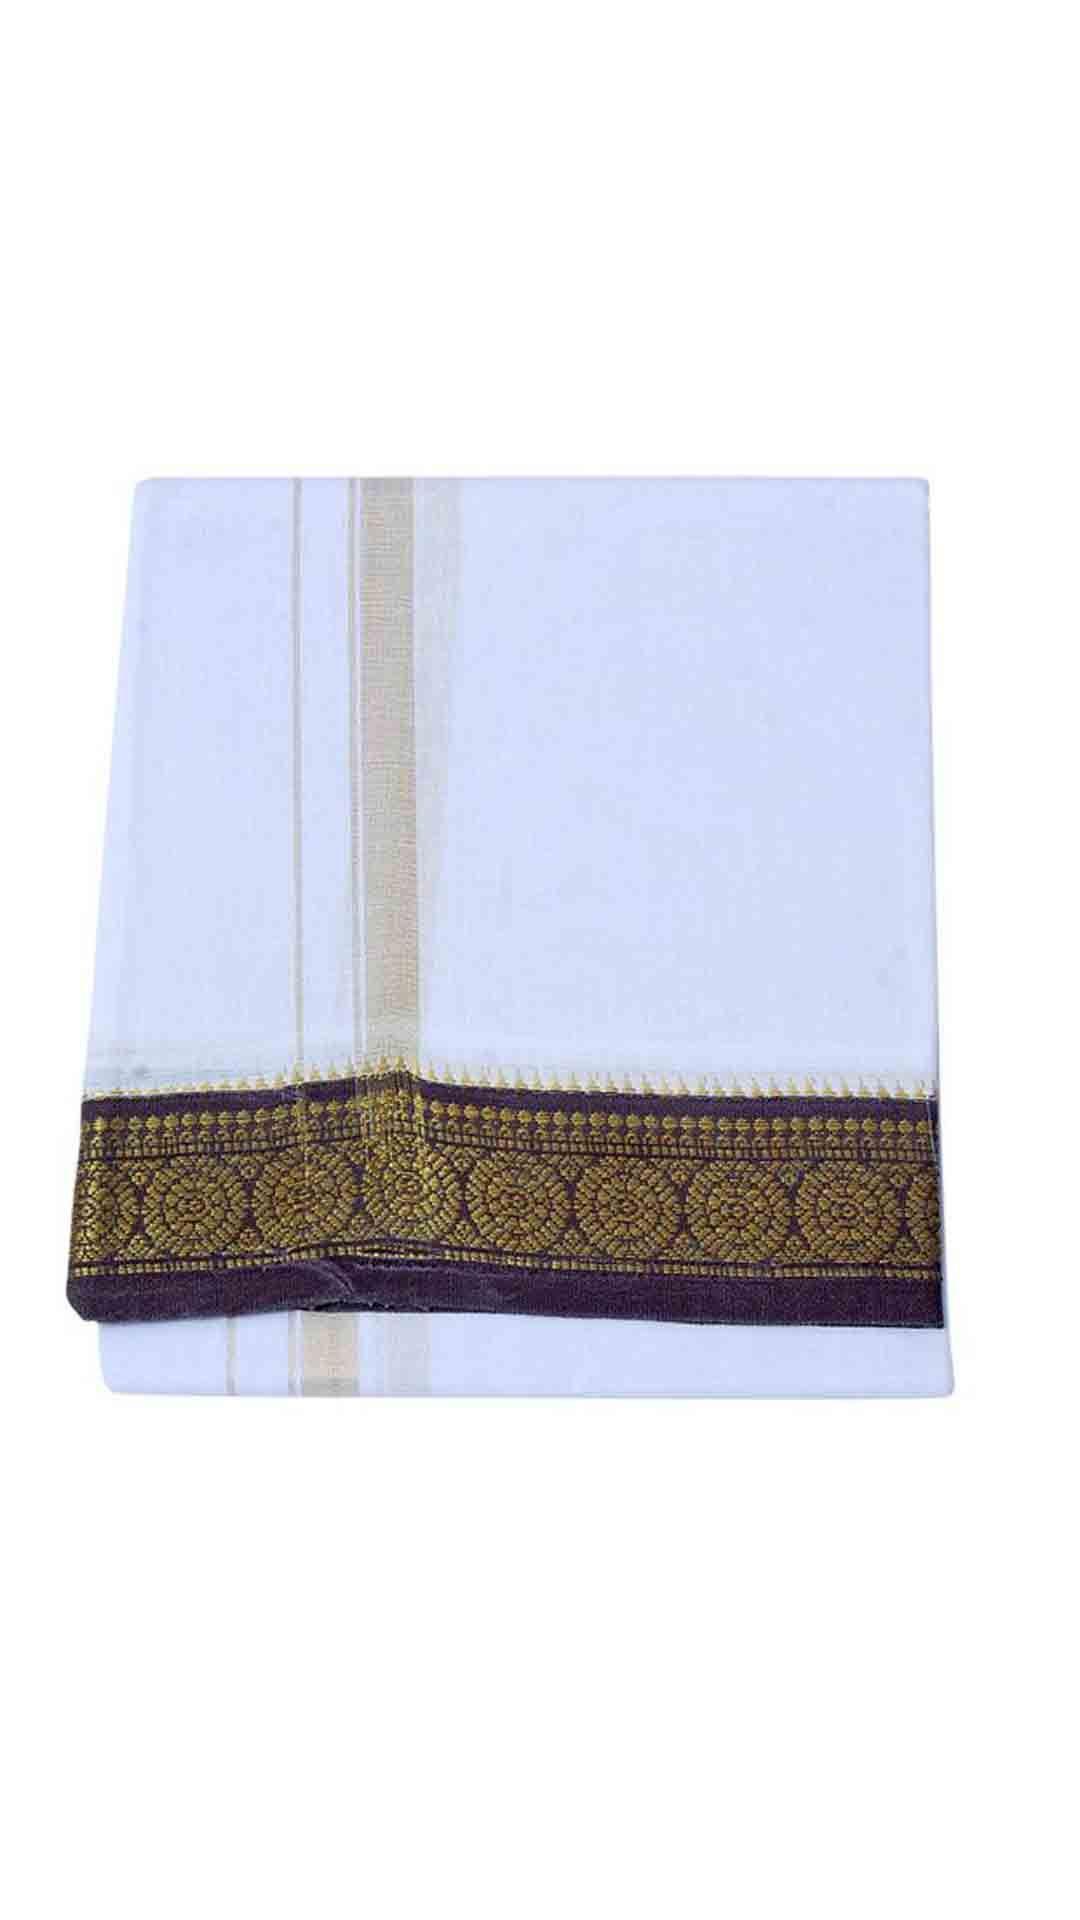 Handloom White Cotton Lungis